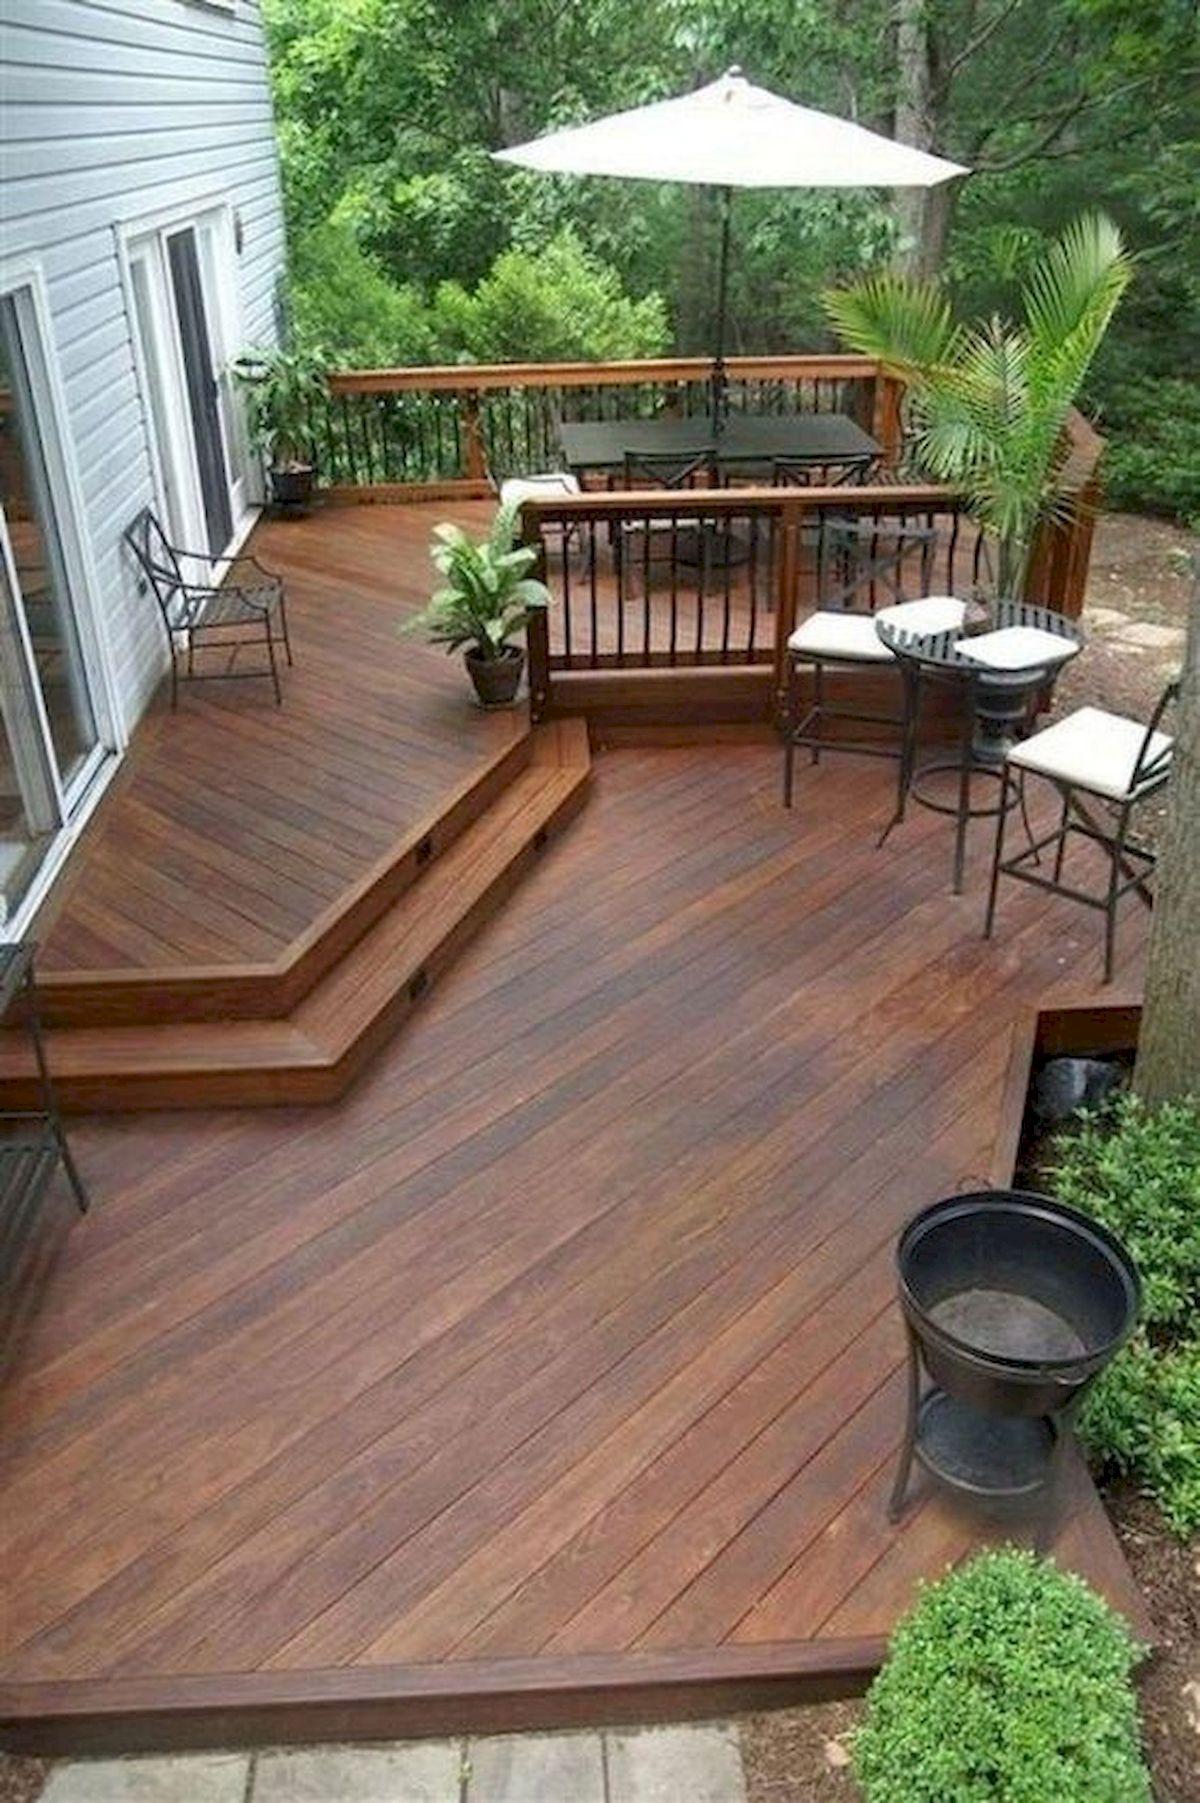 50 Best DIY Backyard Patio and Decking Design Ideas (49)